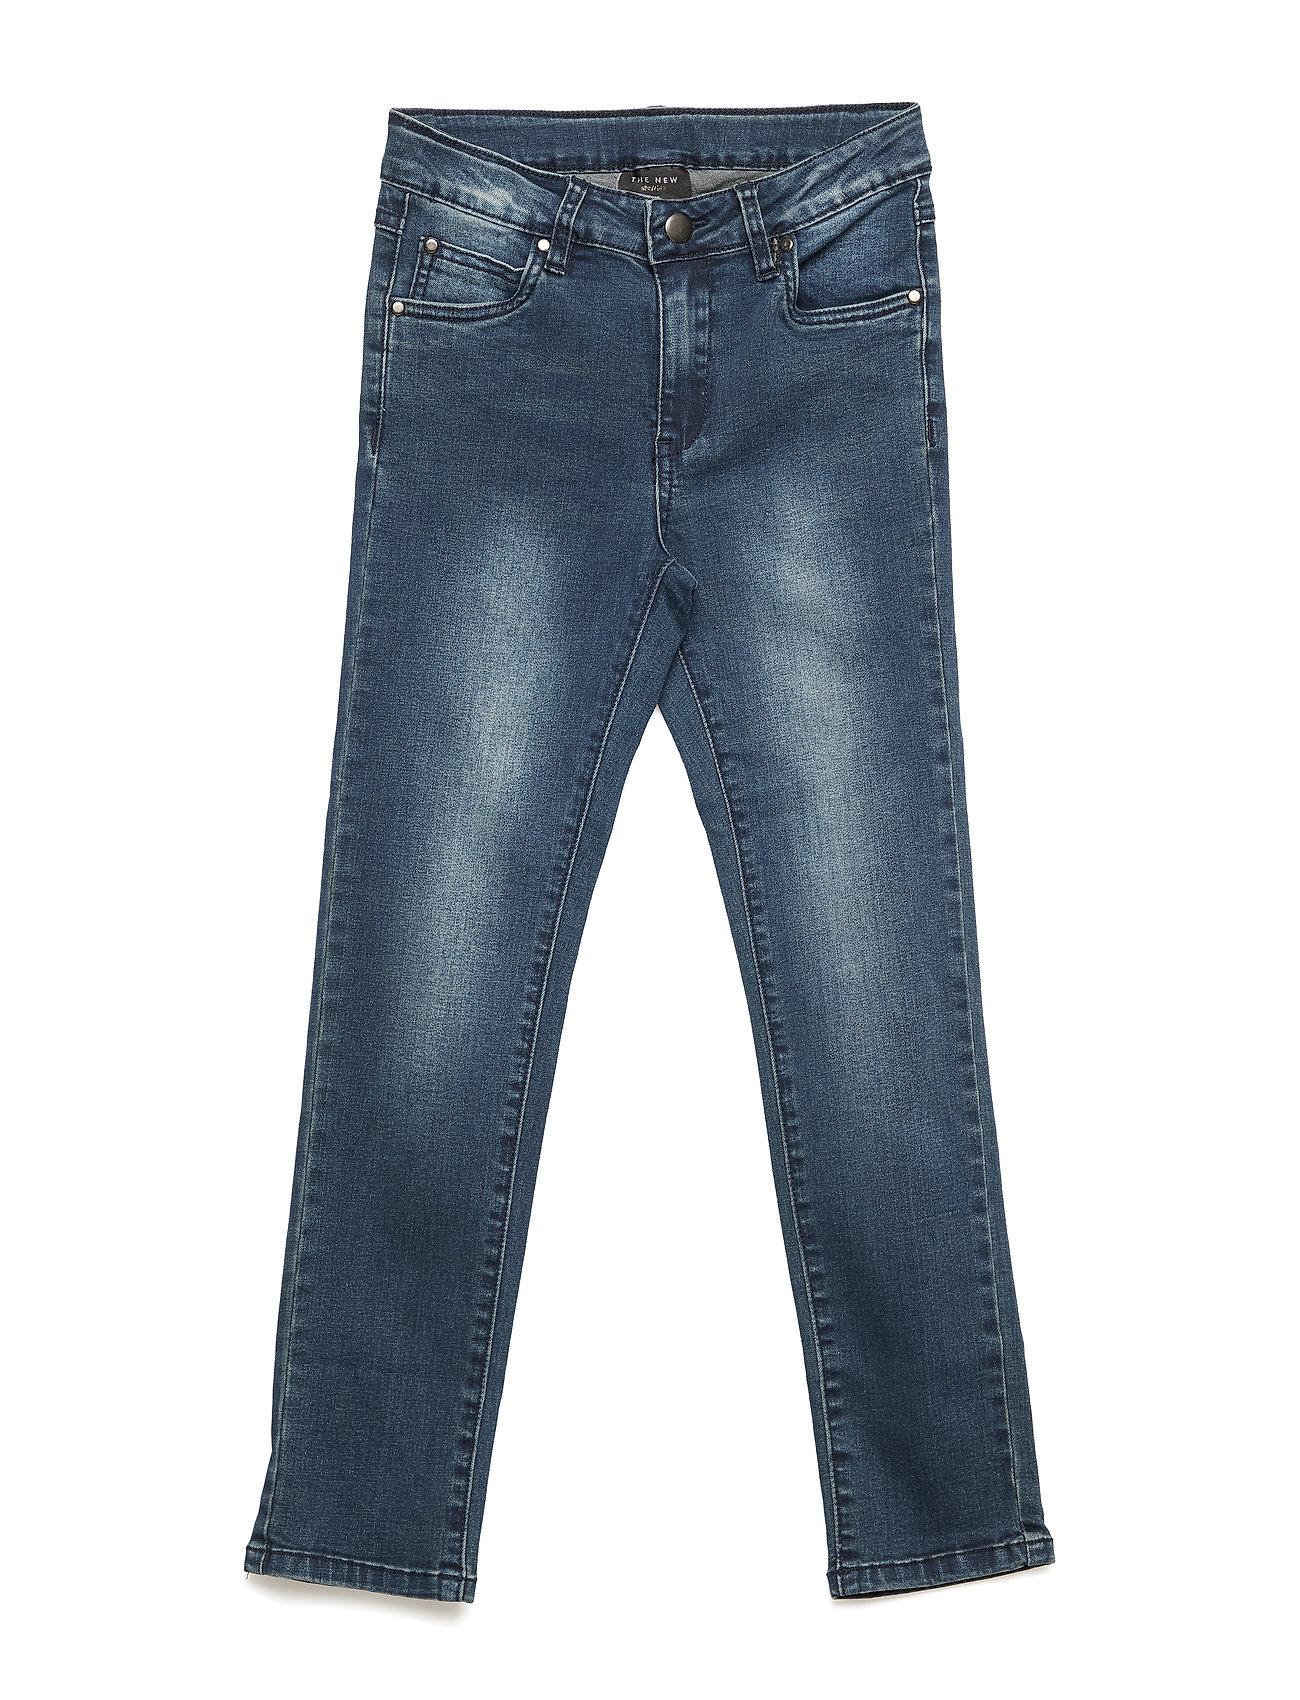 Image of Abel Tight Jeans-Blue Denim (3090829529)